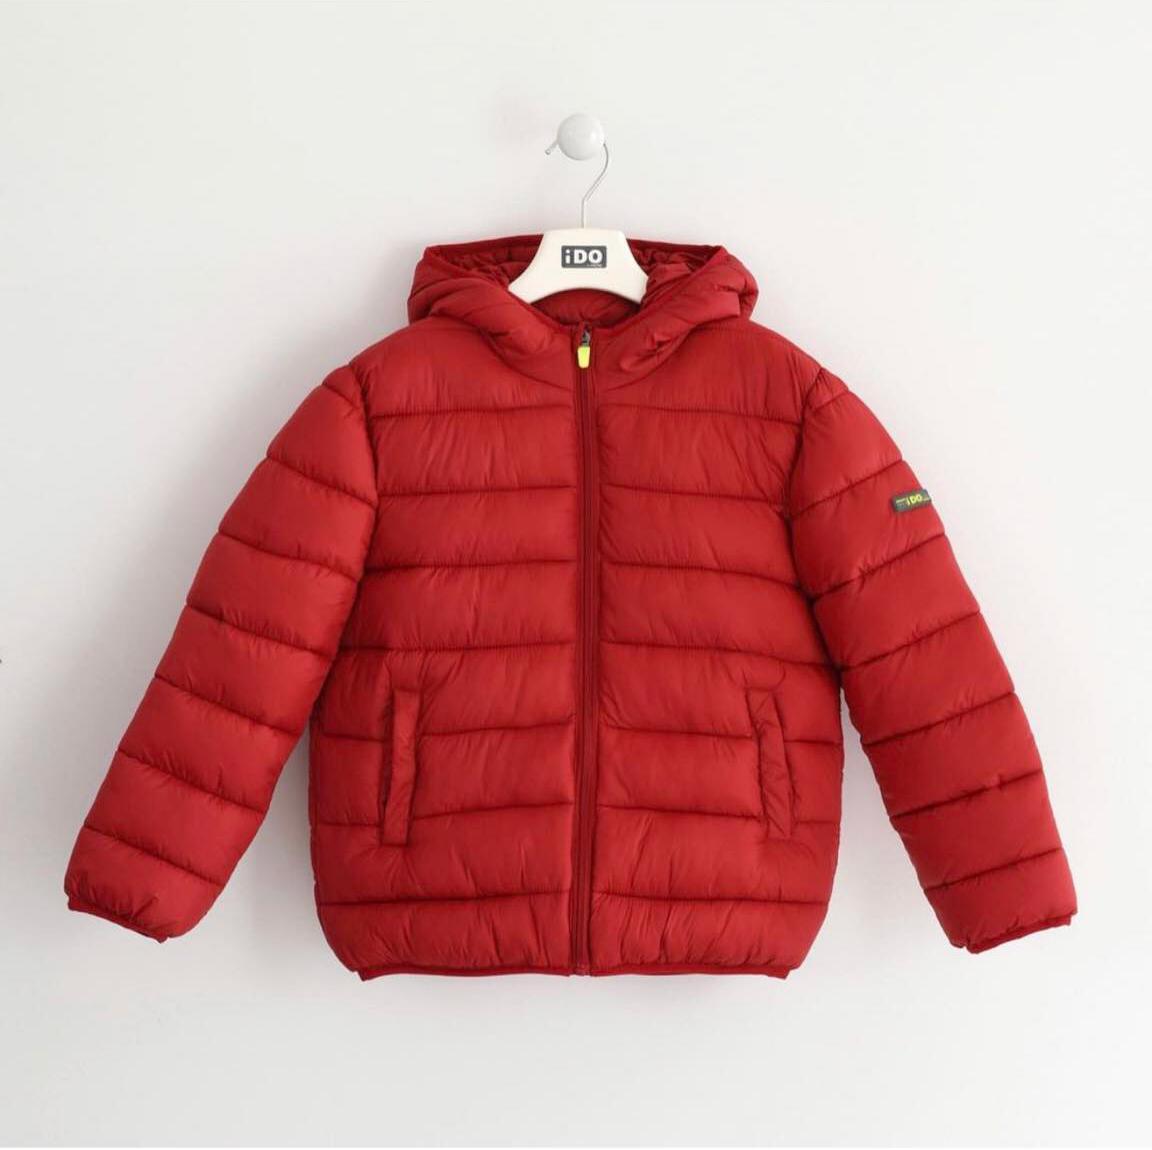 piros téli kabát fiú